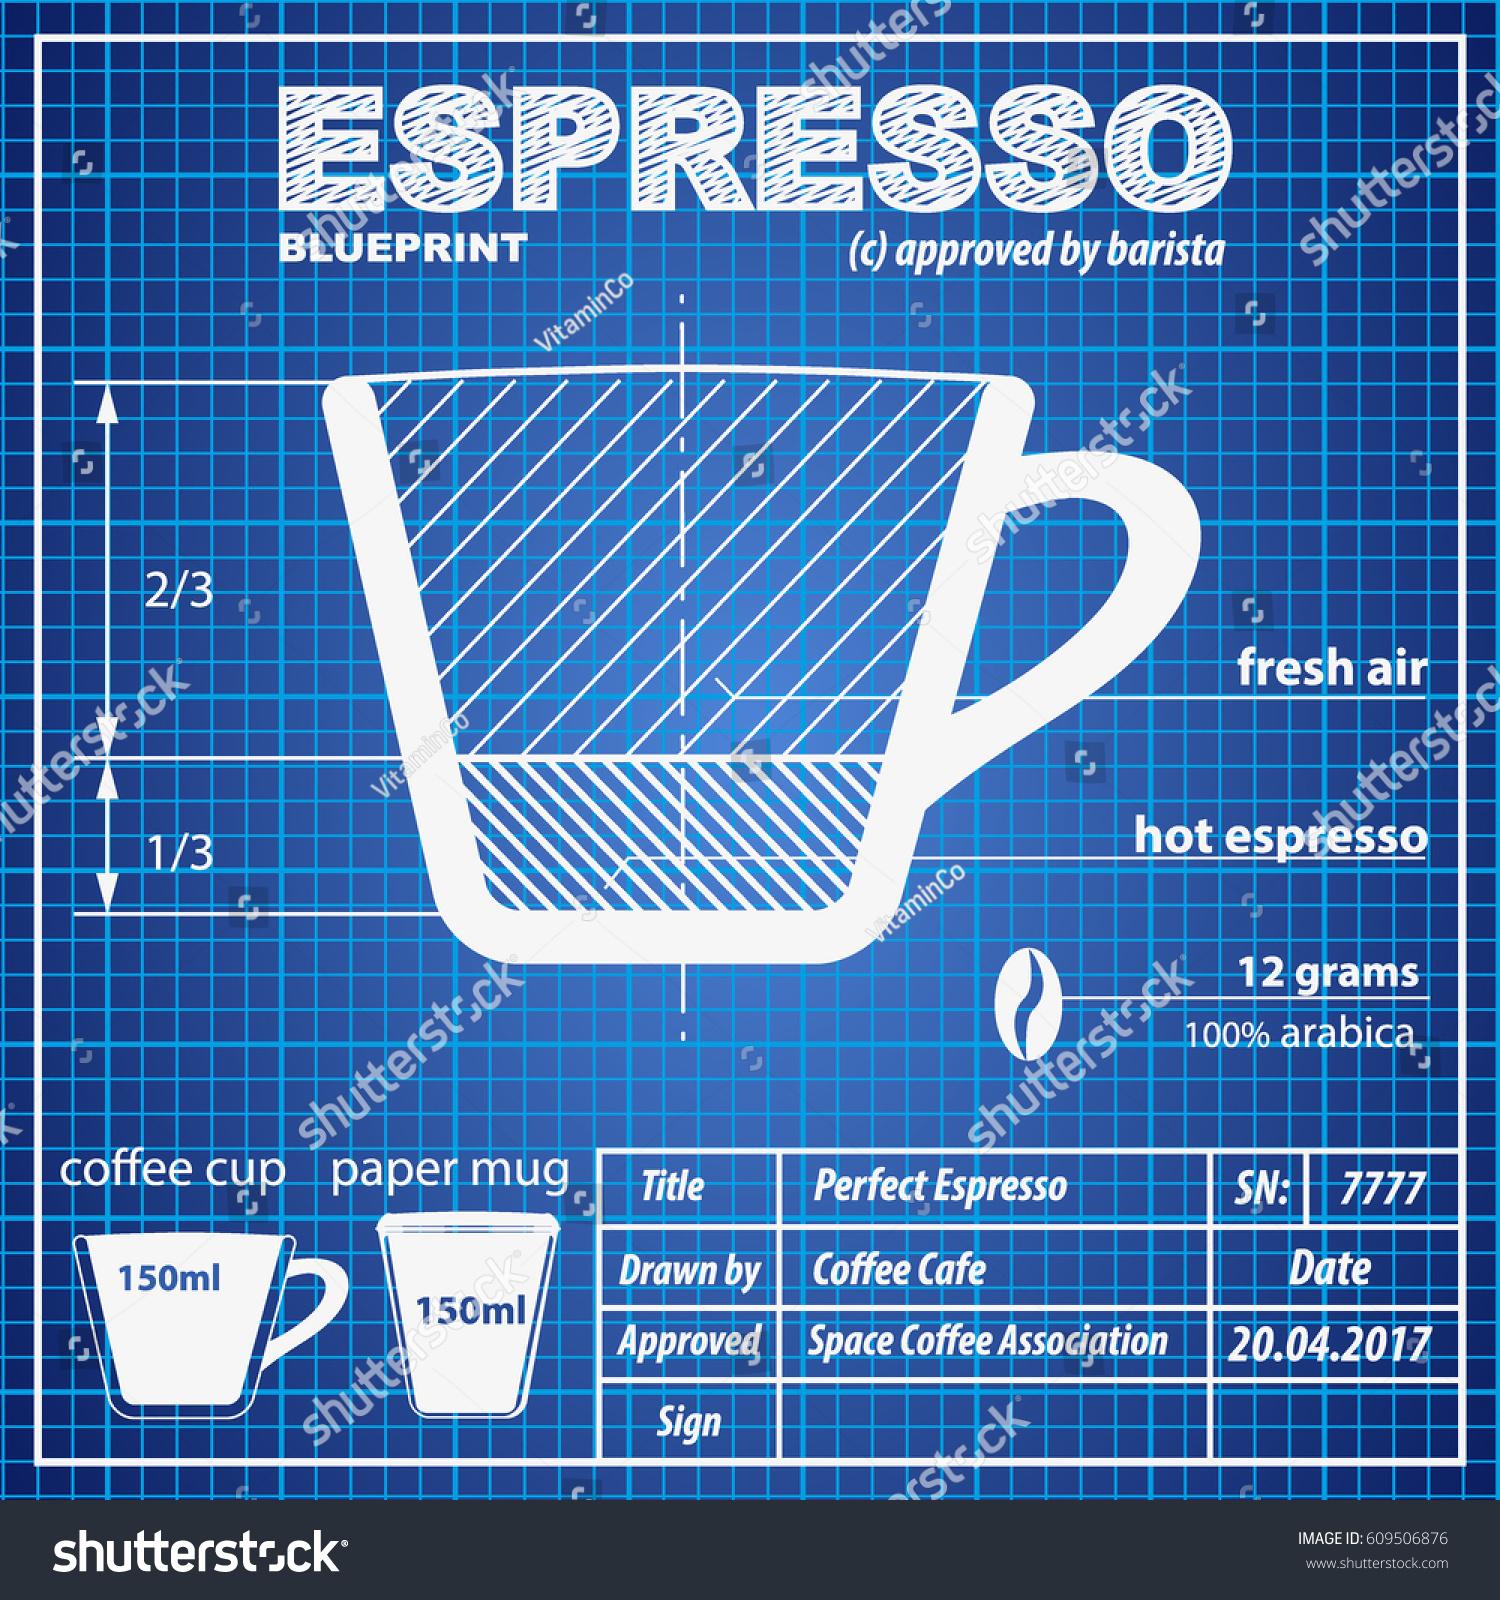 Blueprint Cafe Review